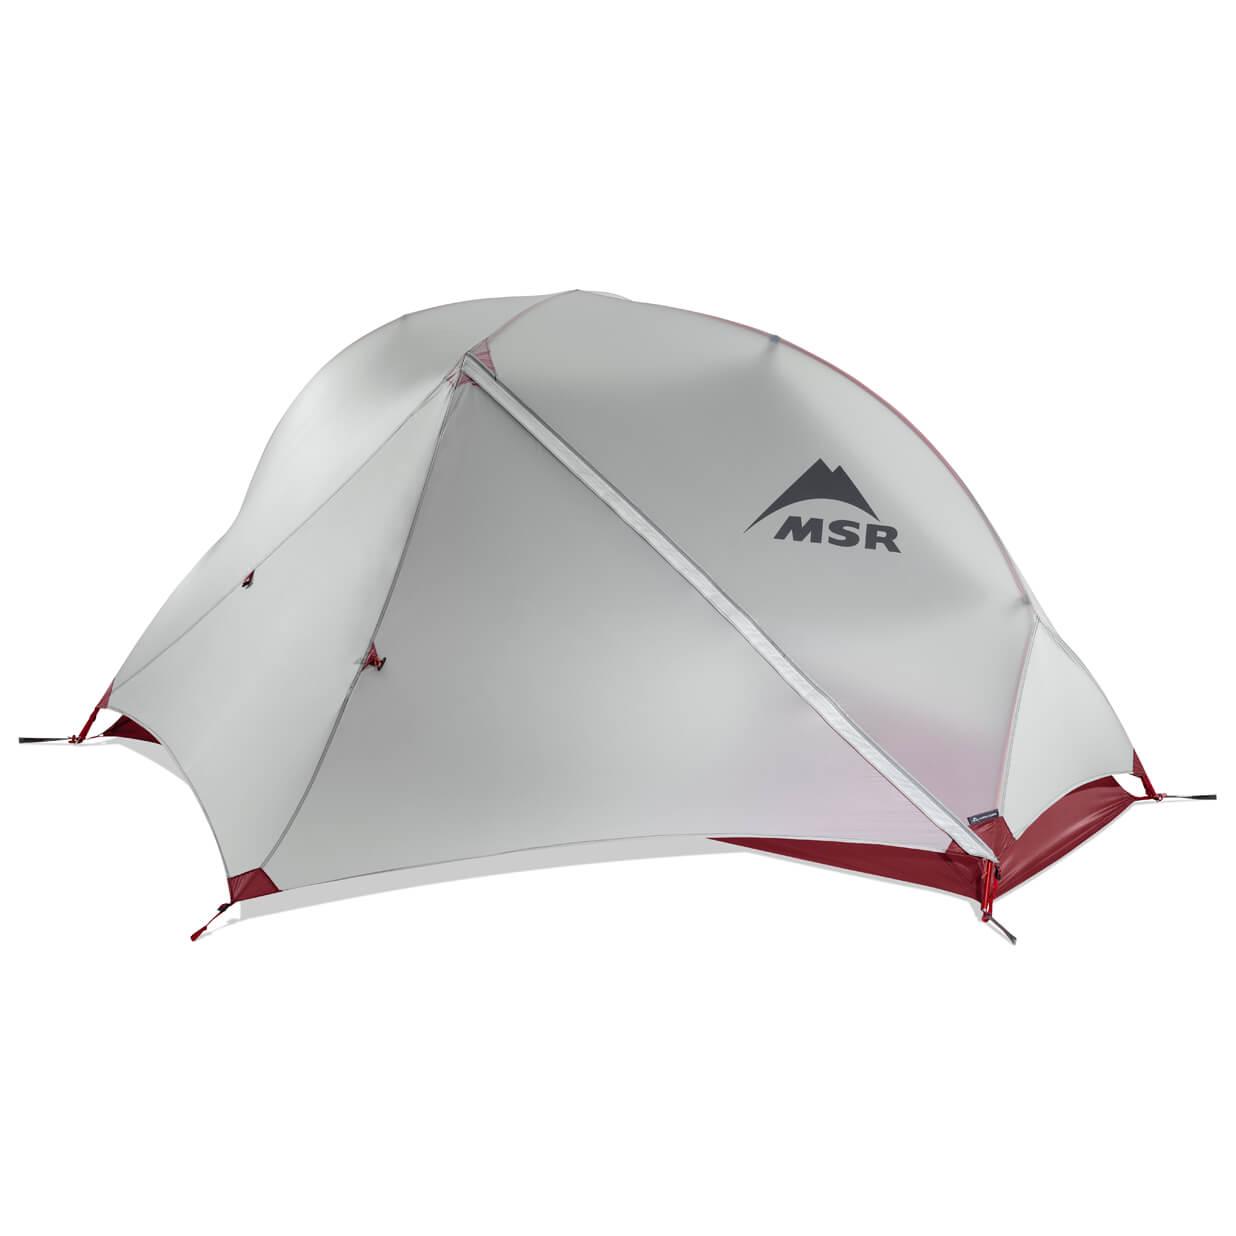 MSR Hubba NX 1 Personenzelt 1 Personen Zelt online